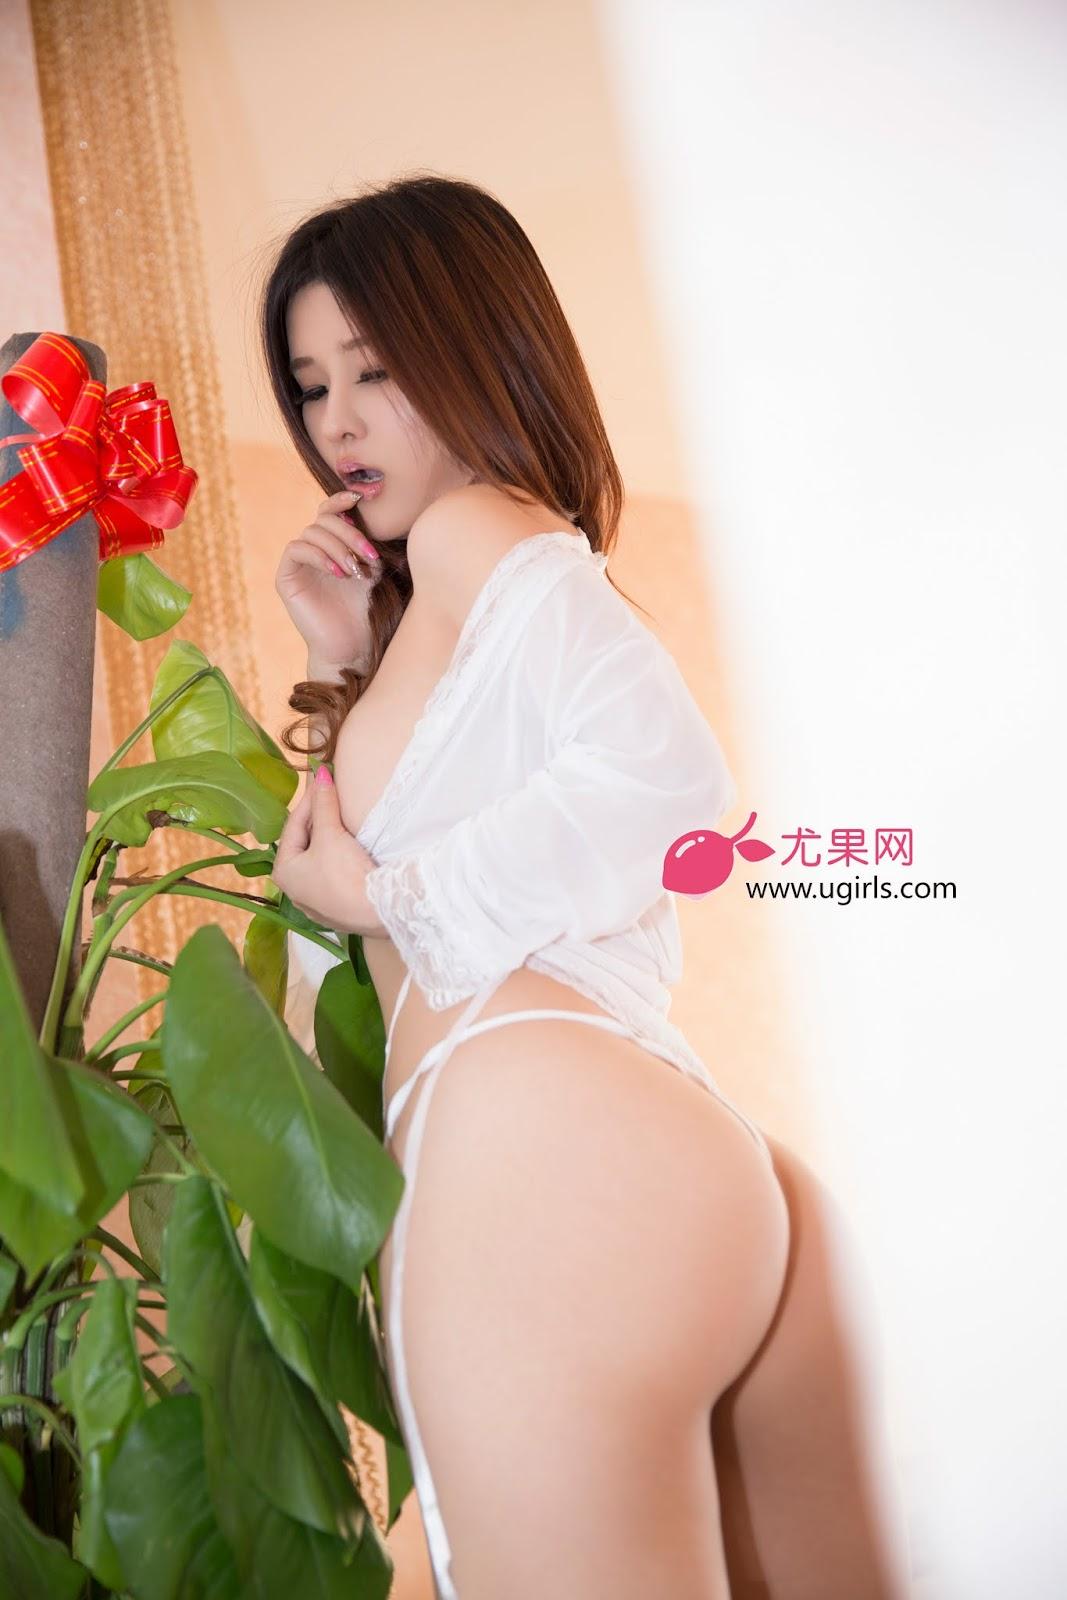 A14A6285 - Hot Photo UGIRLS NO.5 Nude Girl